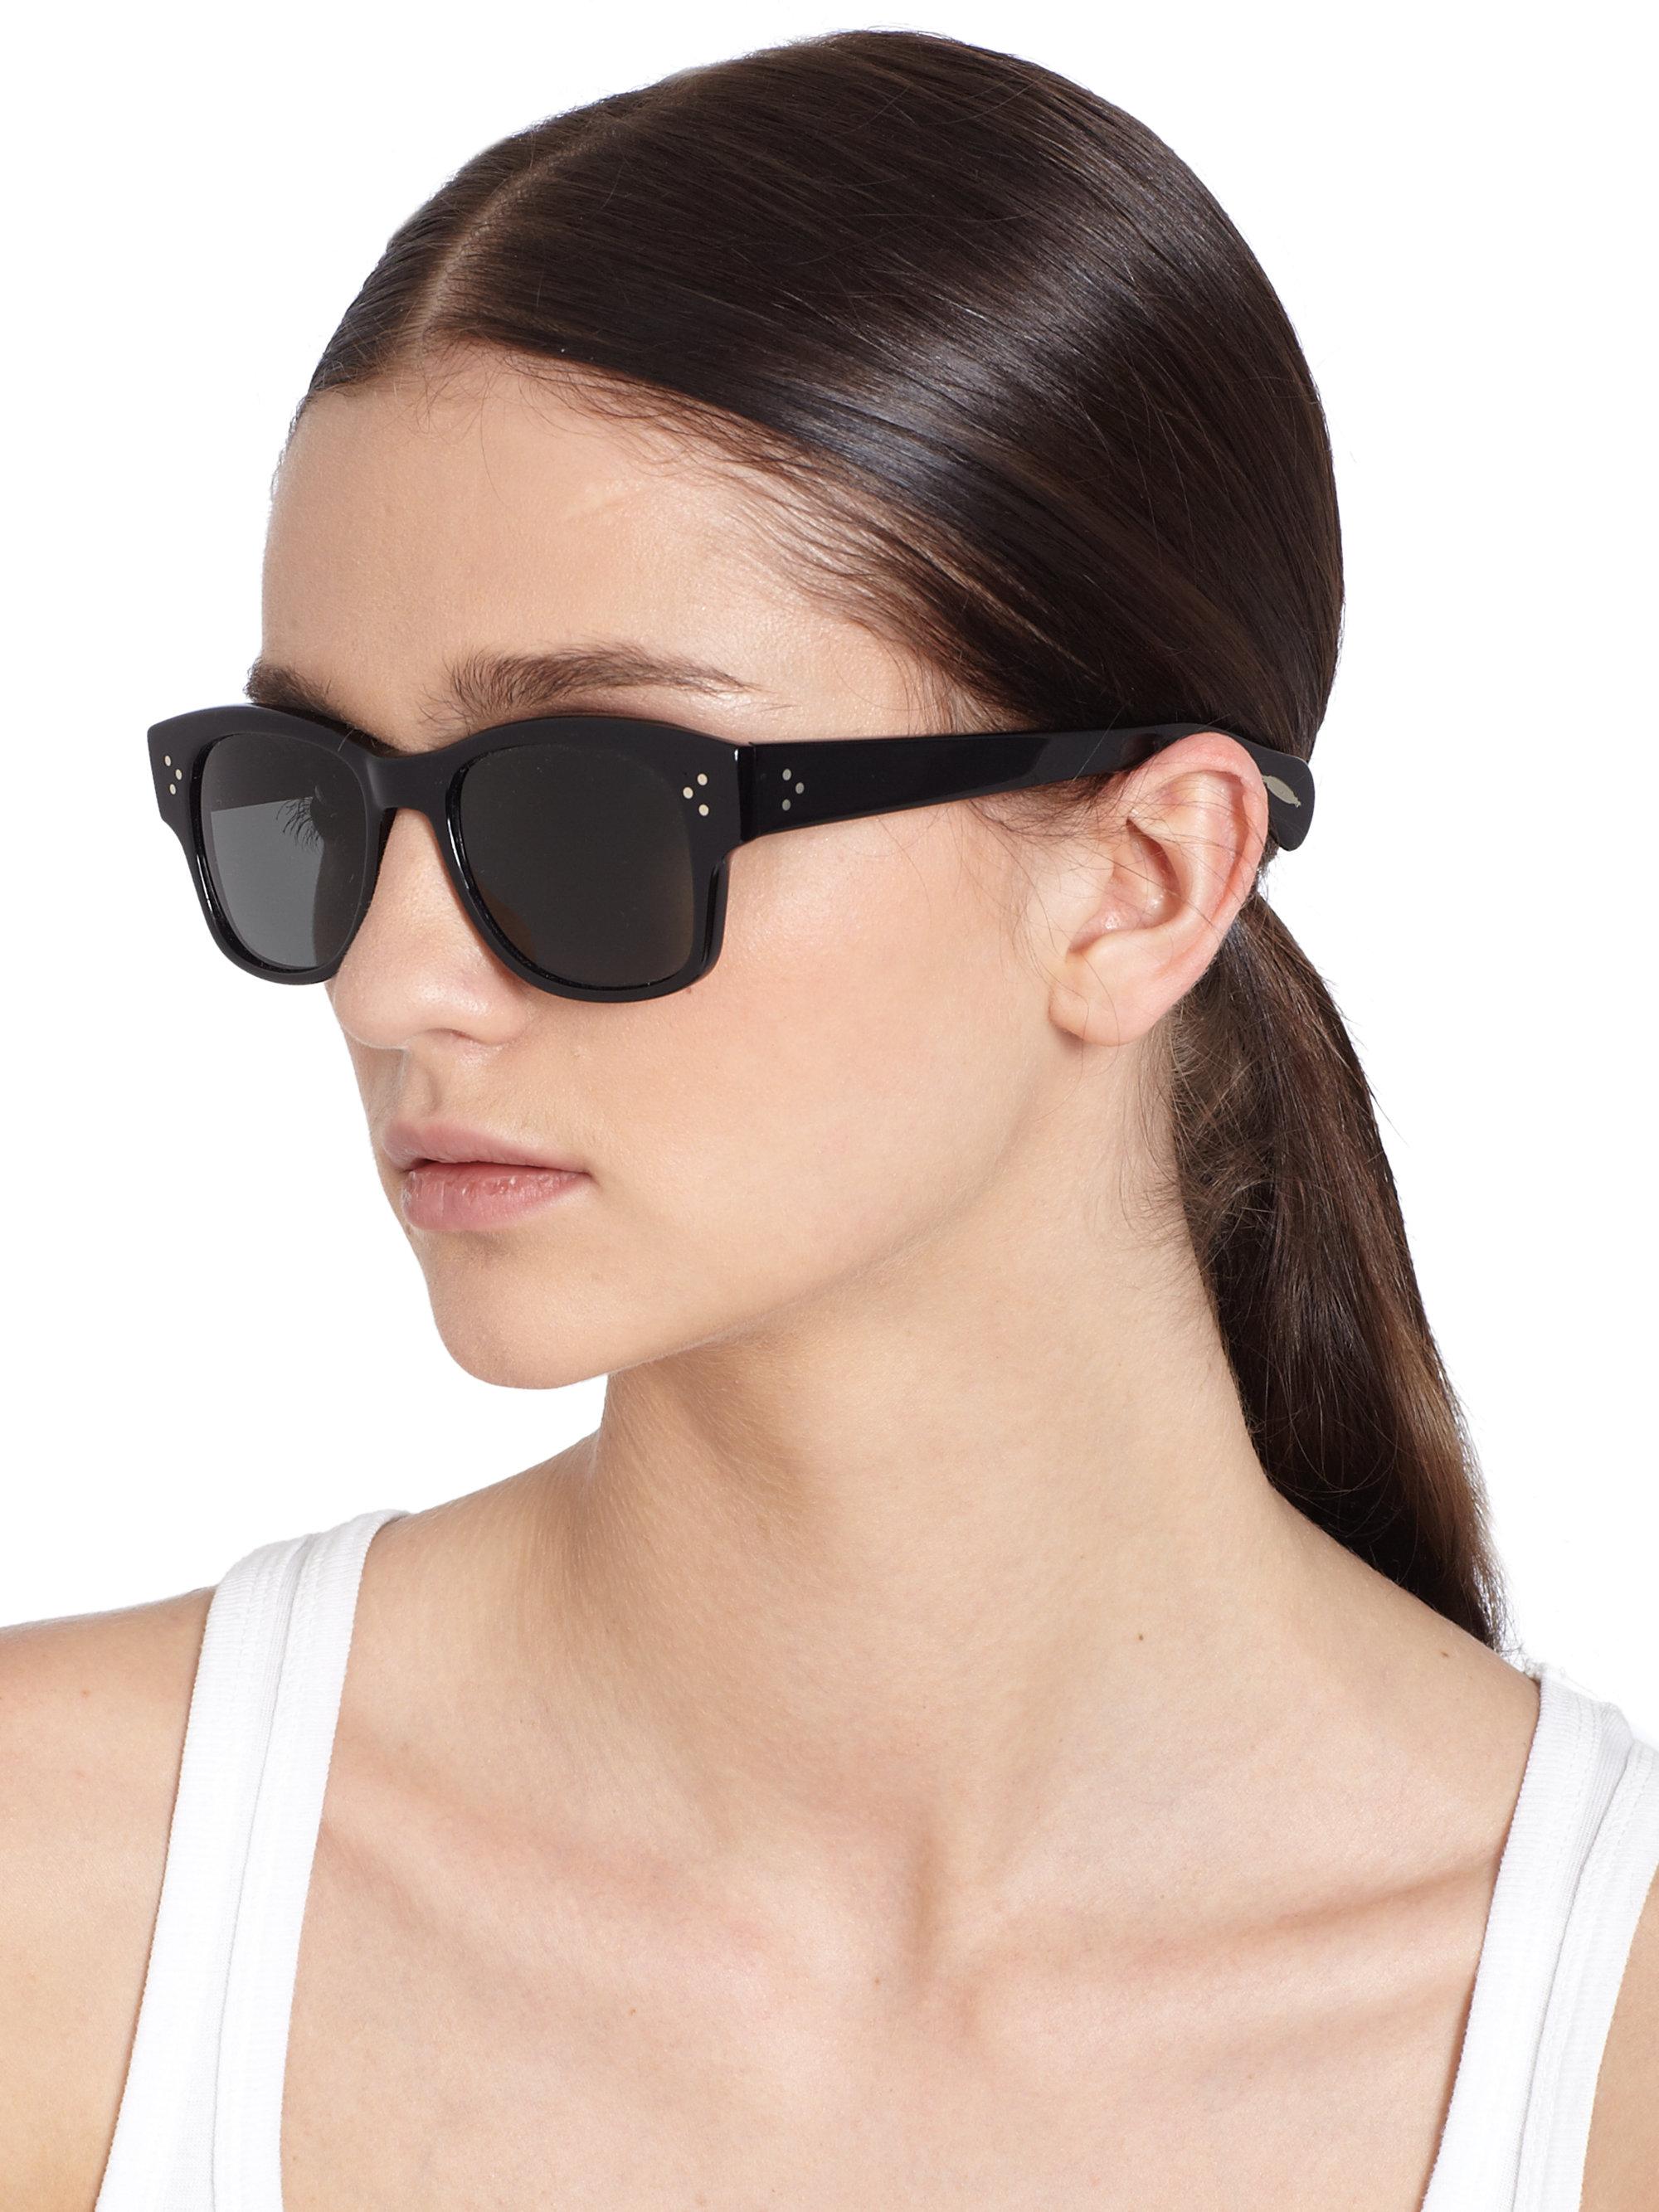 2801cd1c68 Oliver Peoples Jannsson Square Acetate Sunglasses/black in Black - Lyst